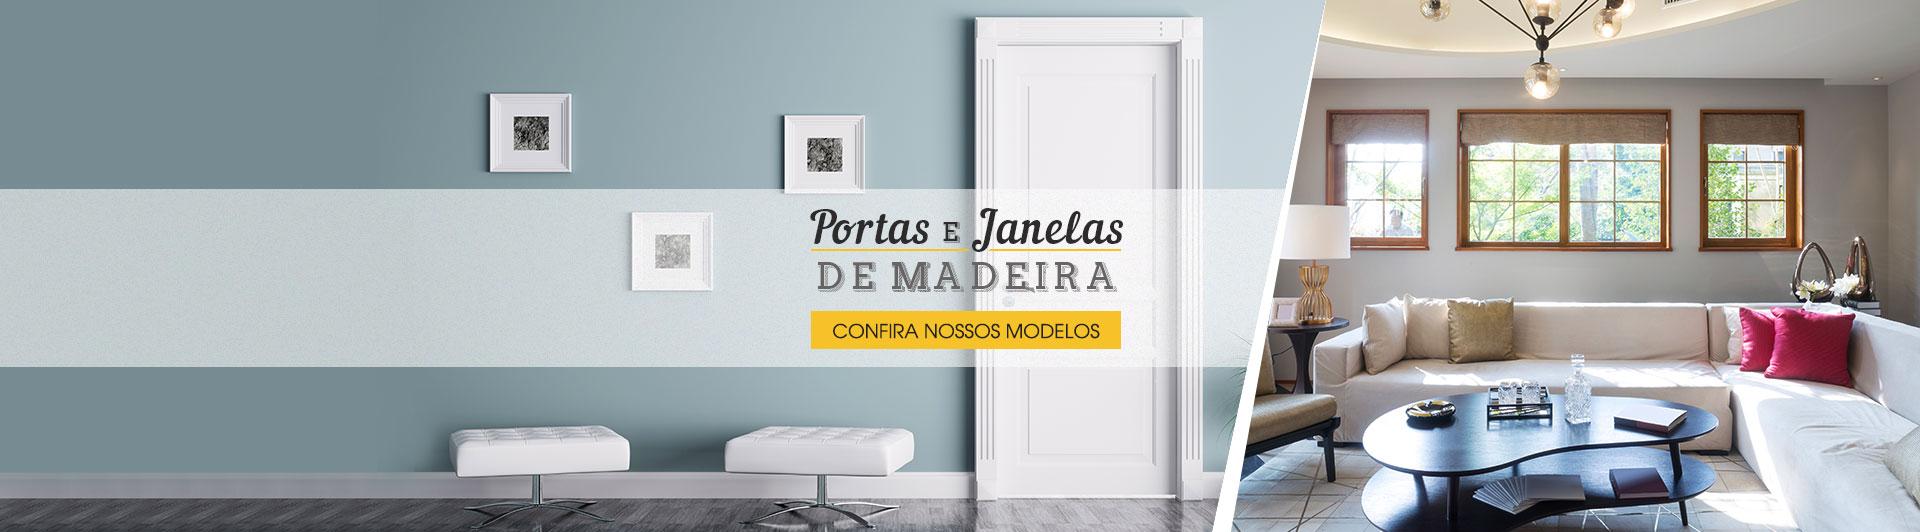 Banner -  Portas e Janelas de Madeira